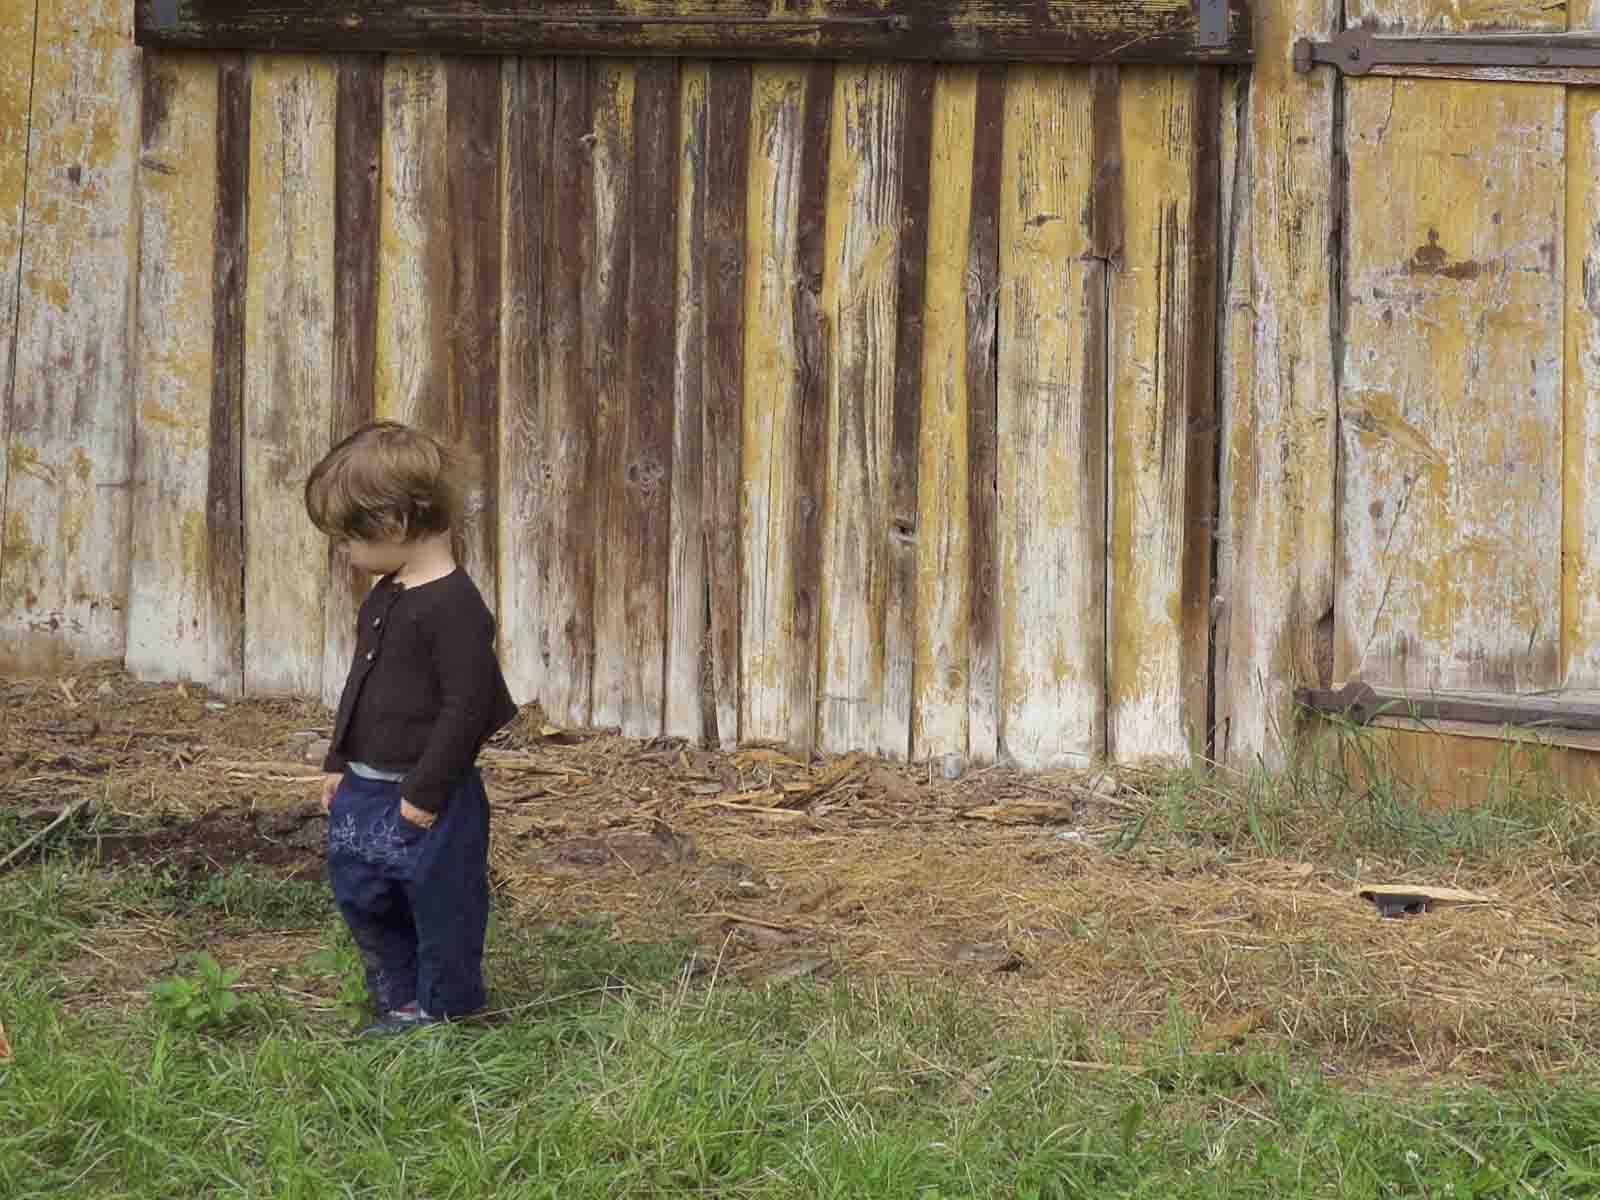 Kinderstrickjacke Juma, 70% Merino/30% Cashmere, Gr. 68-110 Kinderhose Halodri mit Traktorstickerei, 100% Baumwolle, Gr. 68-98